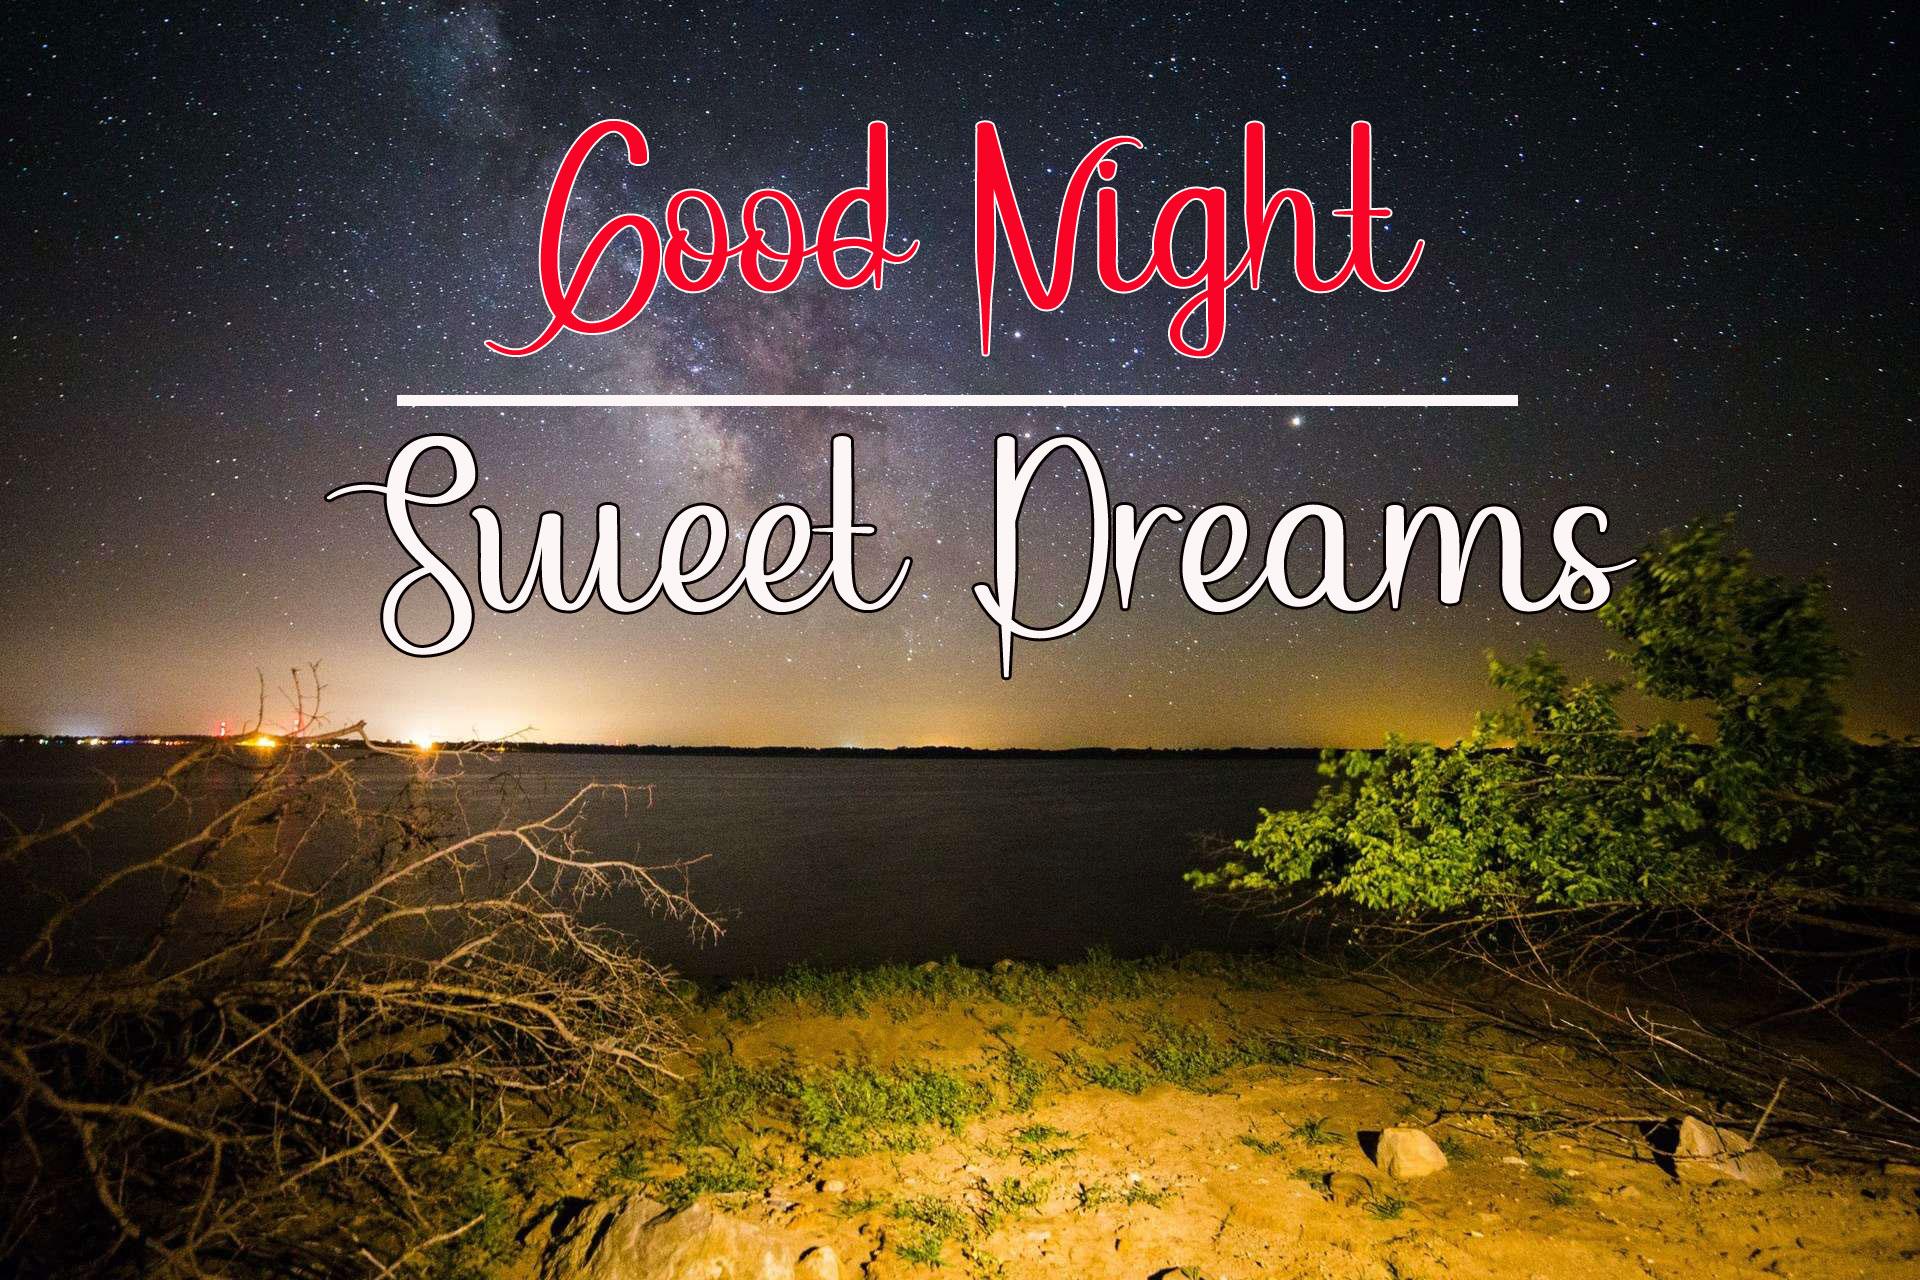 Beautiful Good Night Images photo hd download